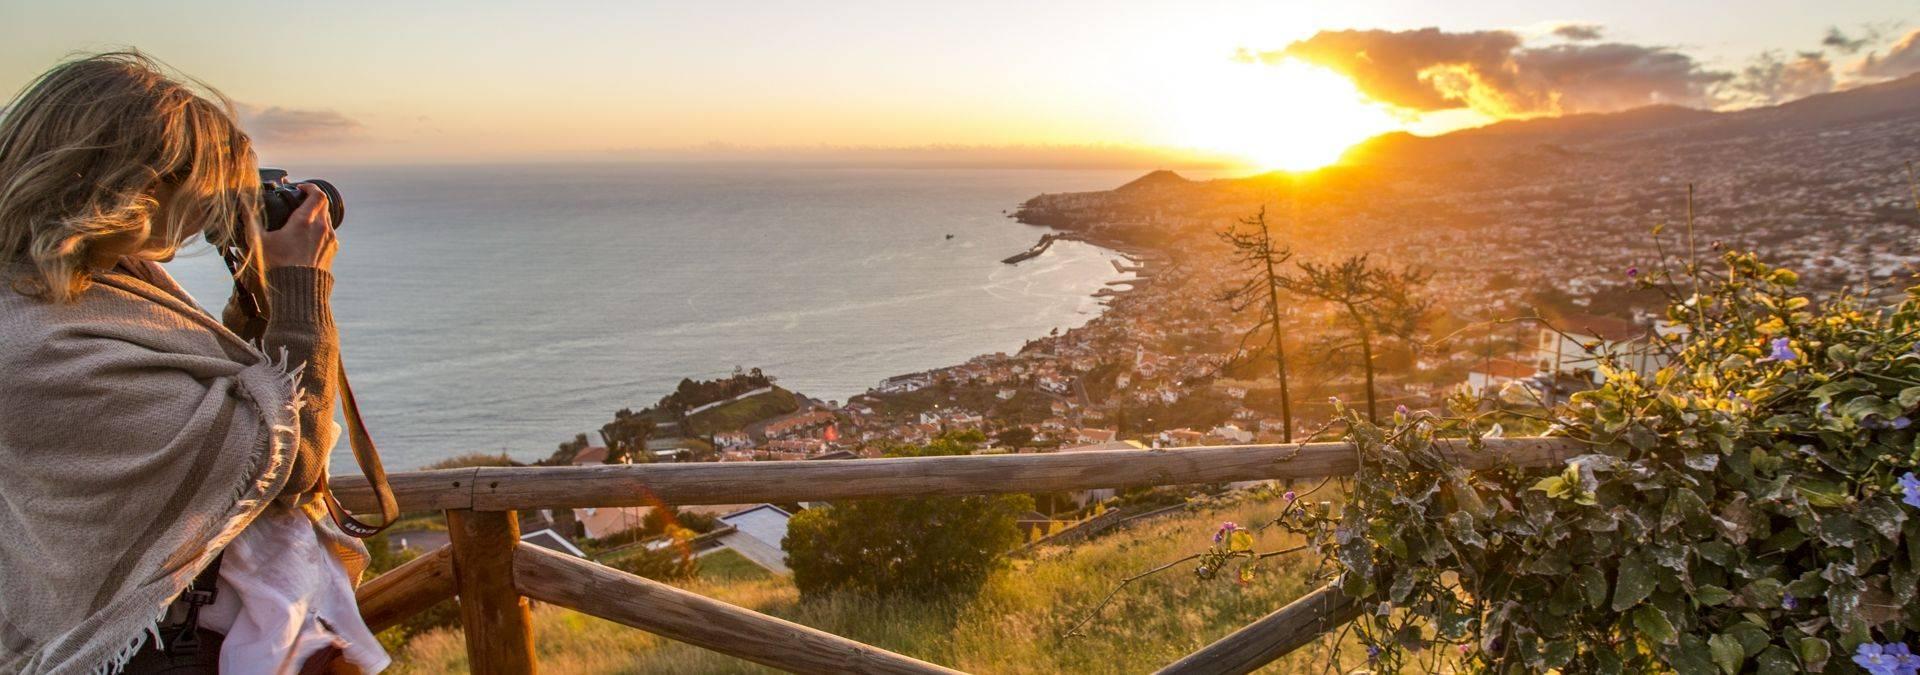 CóPia De ©GregSnell 9634 Palheiro Village Sunset